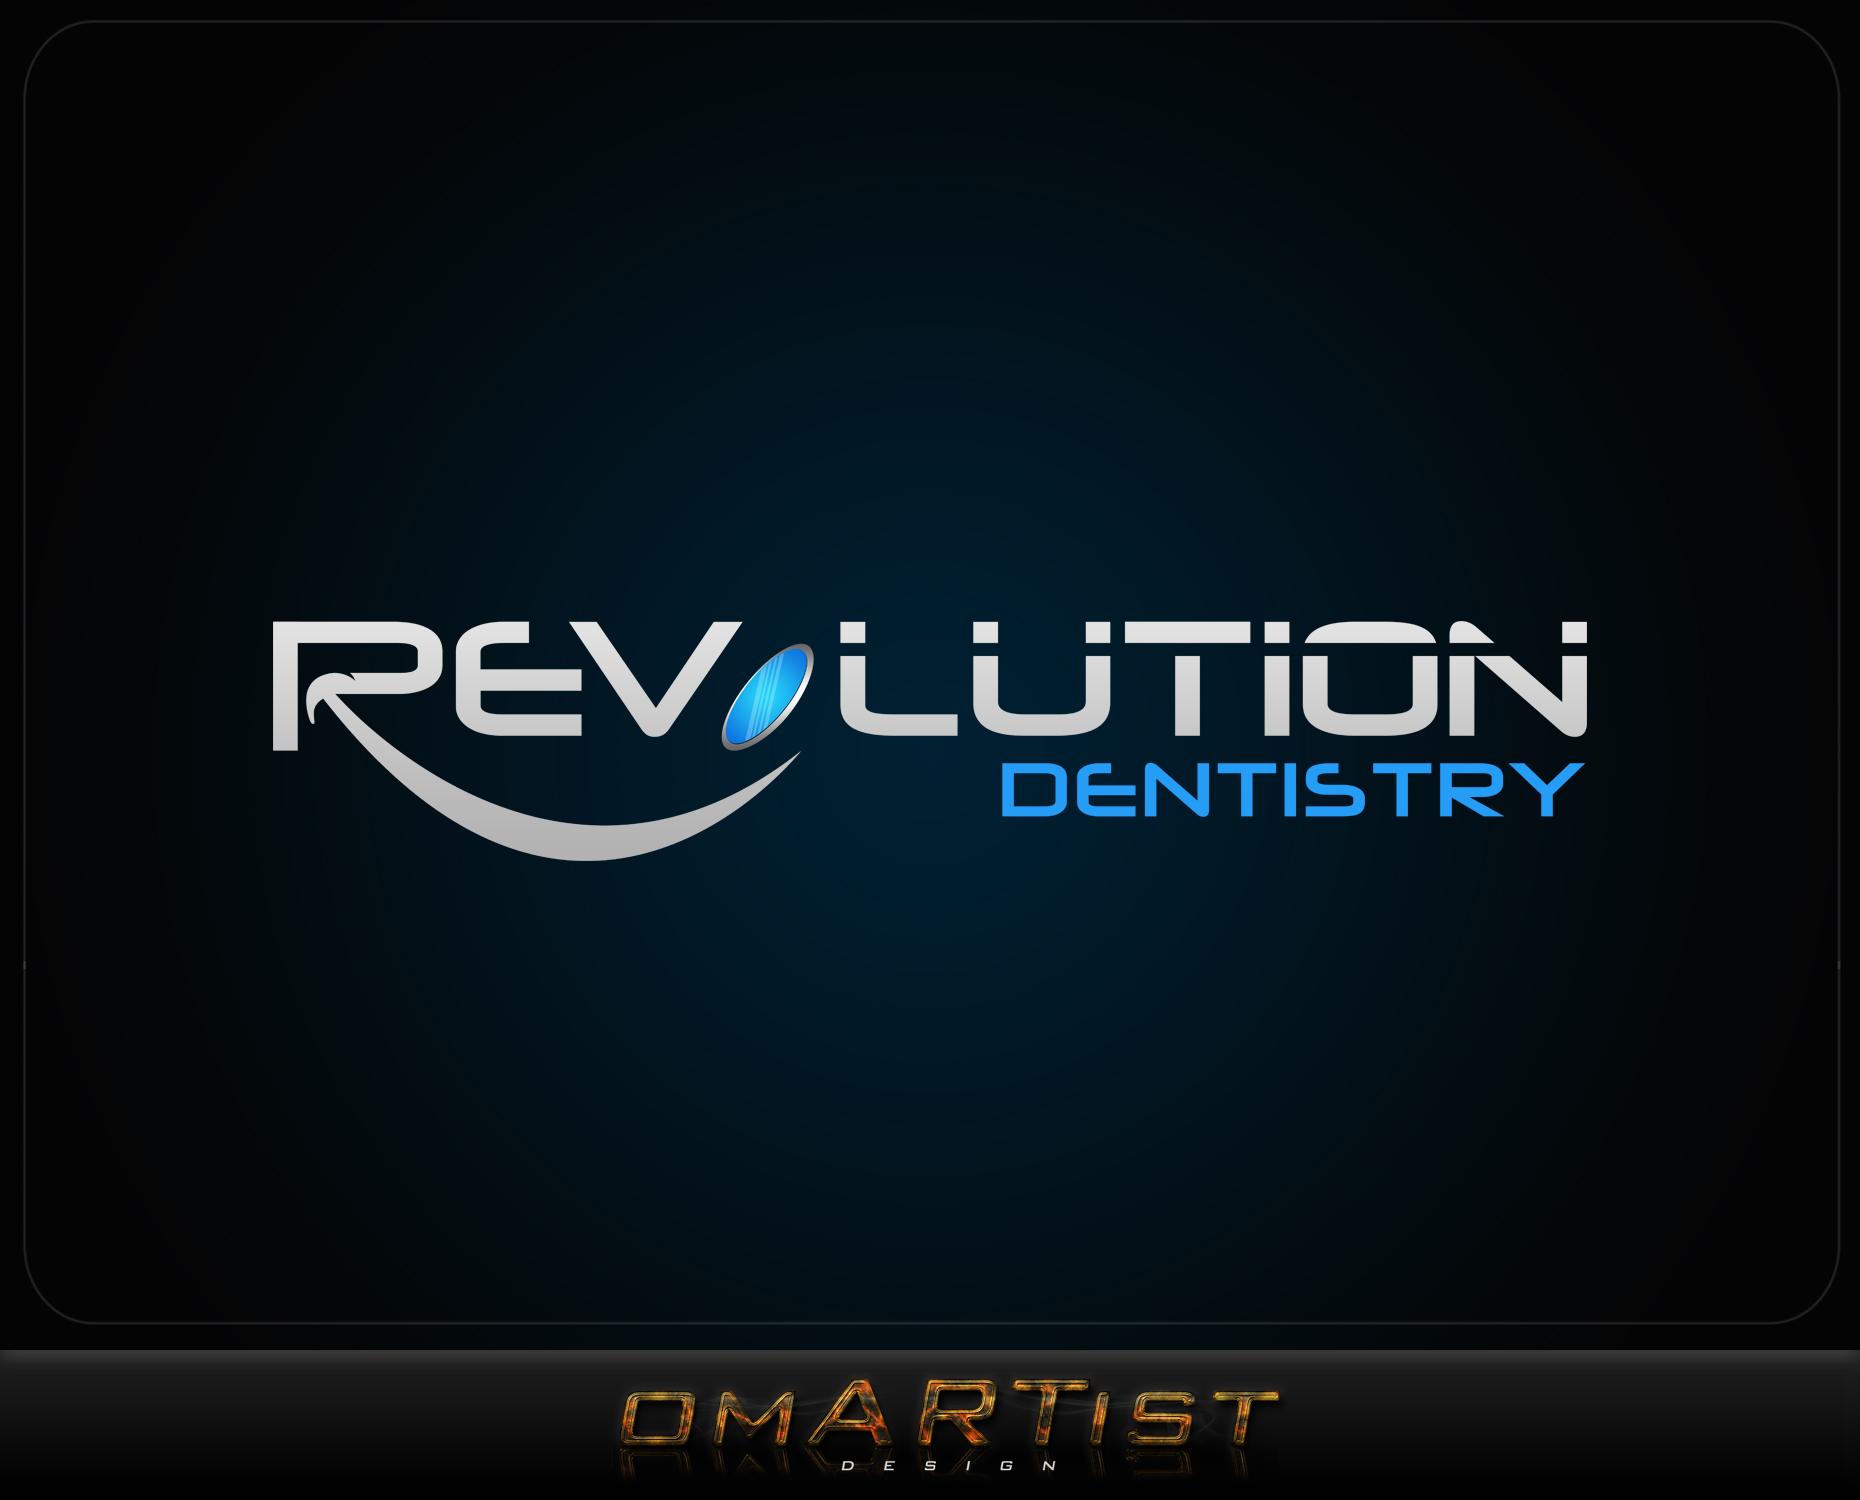 Logo Design by omARTist - Entry No. 262 in the Logo Design Contest Artistic Logo Design for Revolution Dentistry.